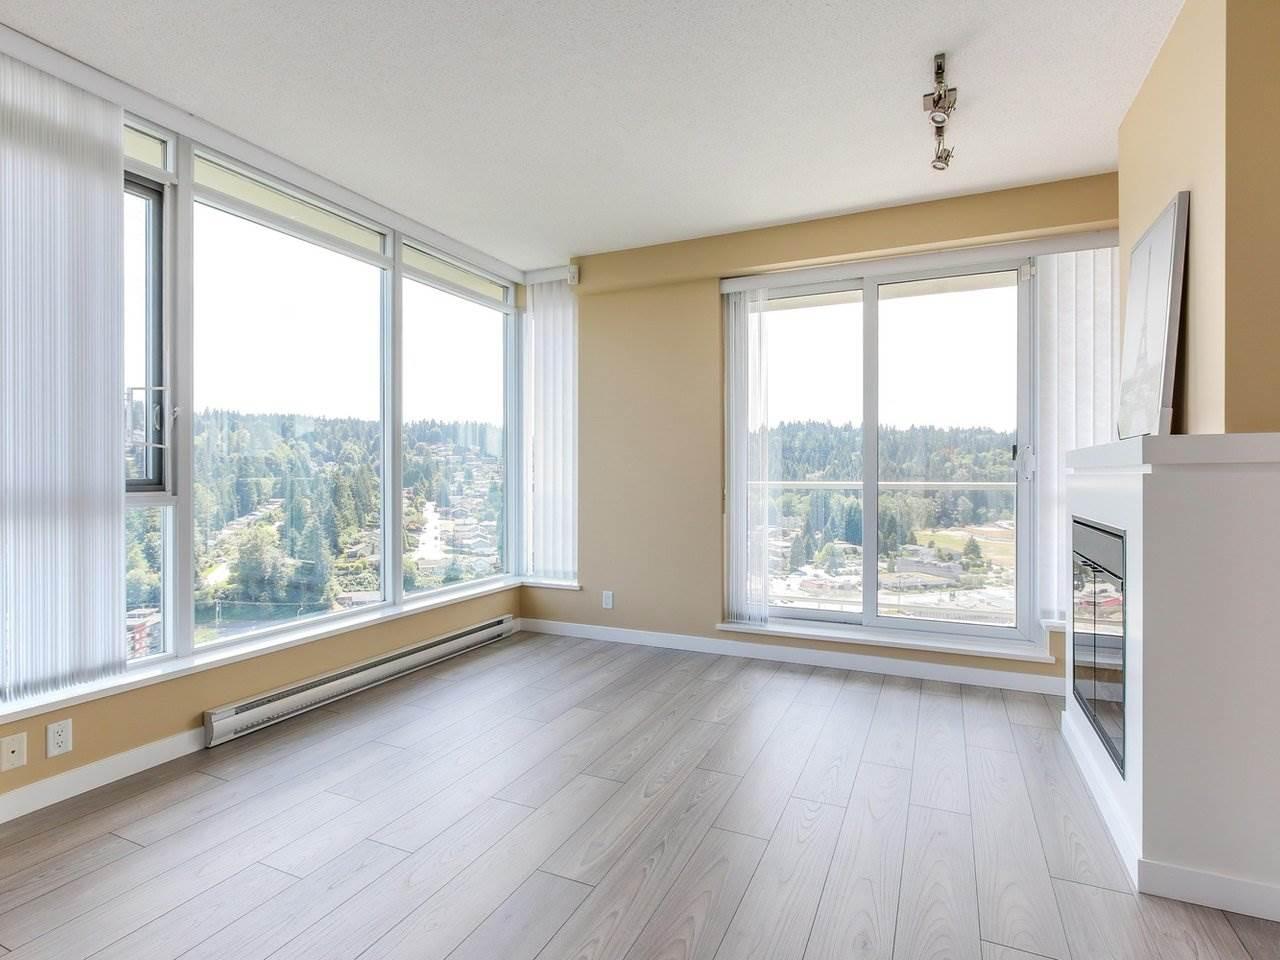 Condo Apartment at 3001 660 NOOTKA WAY, Unit 3001, Port Moody, British Columbia. Image 7